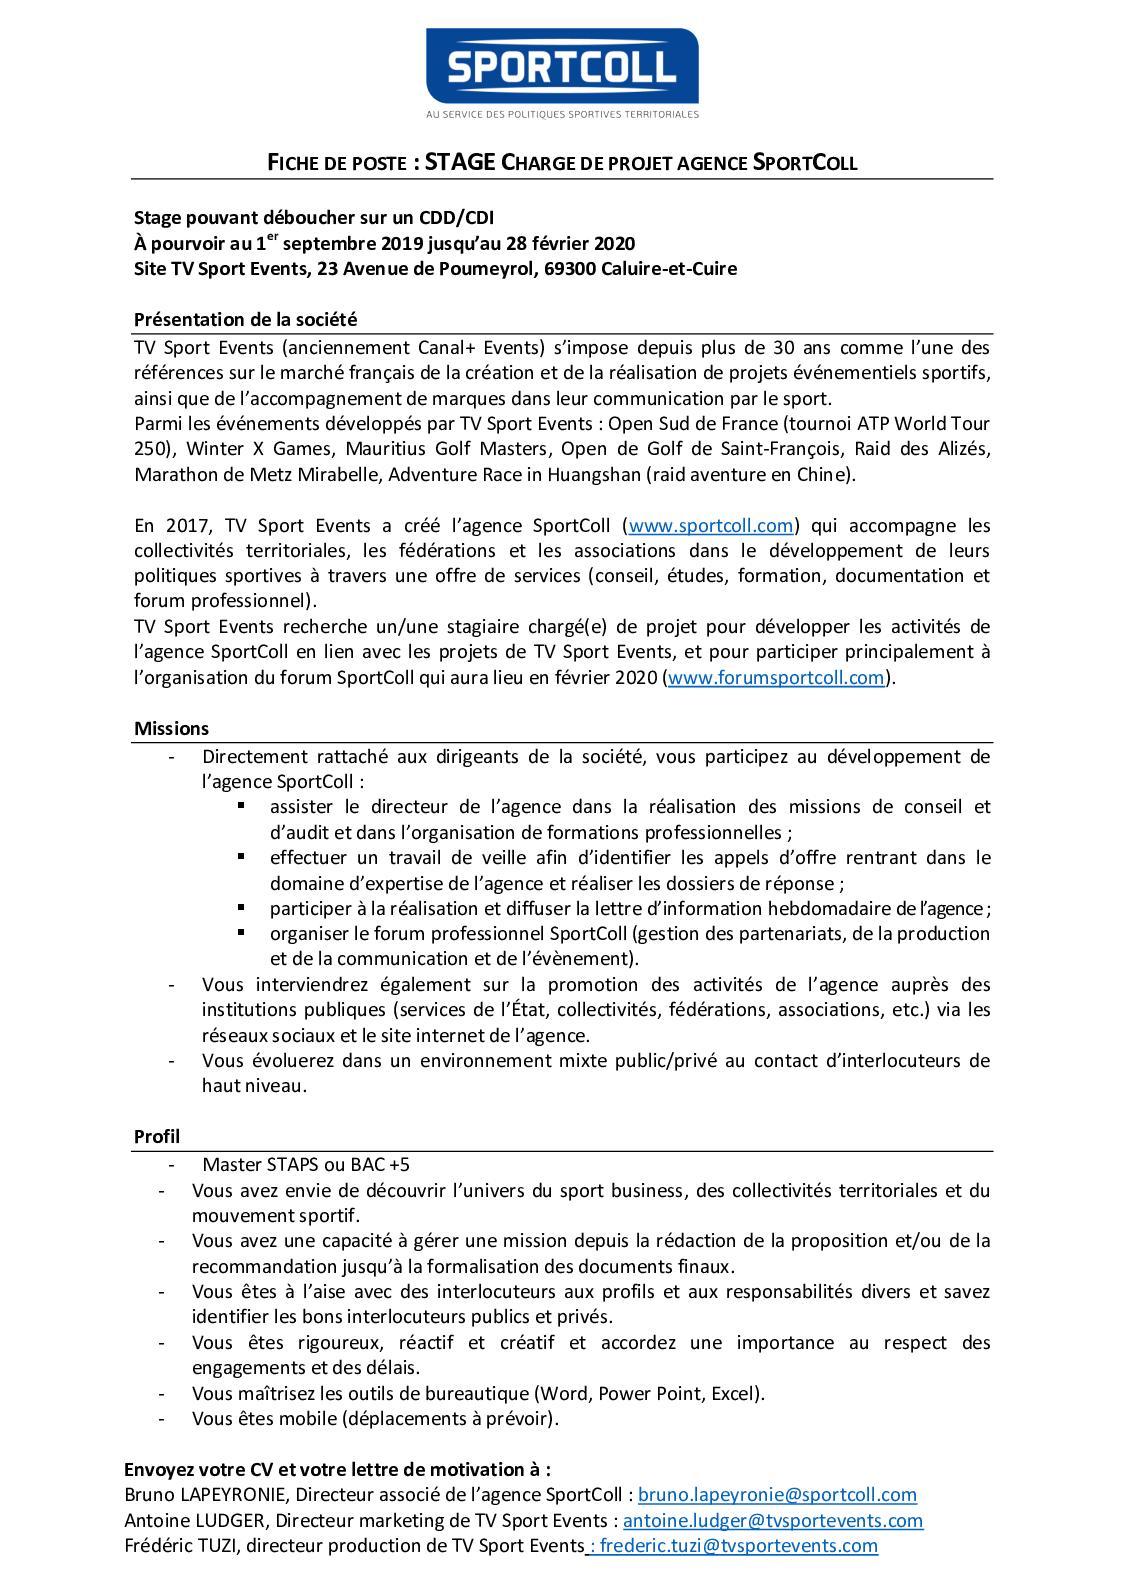 Calaméo Césure Chef Projet Agence Sportcoll